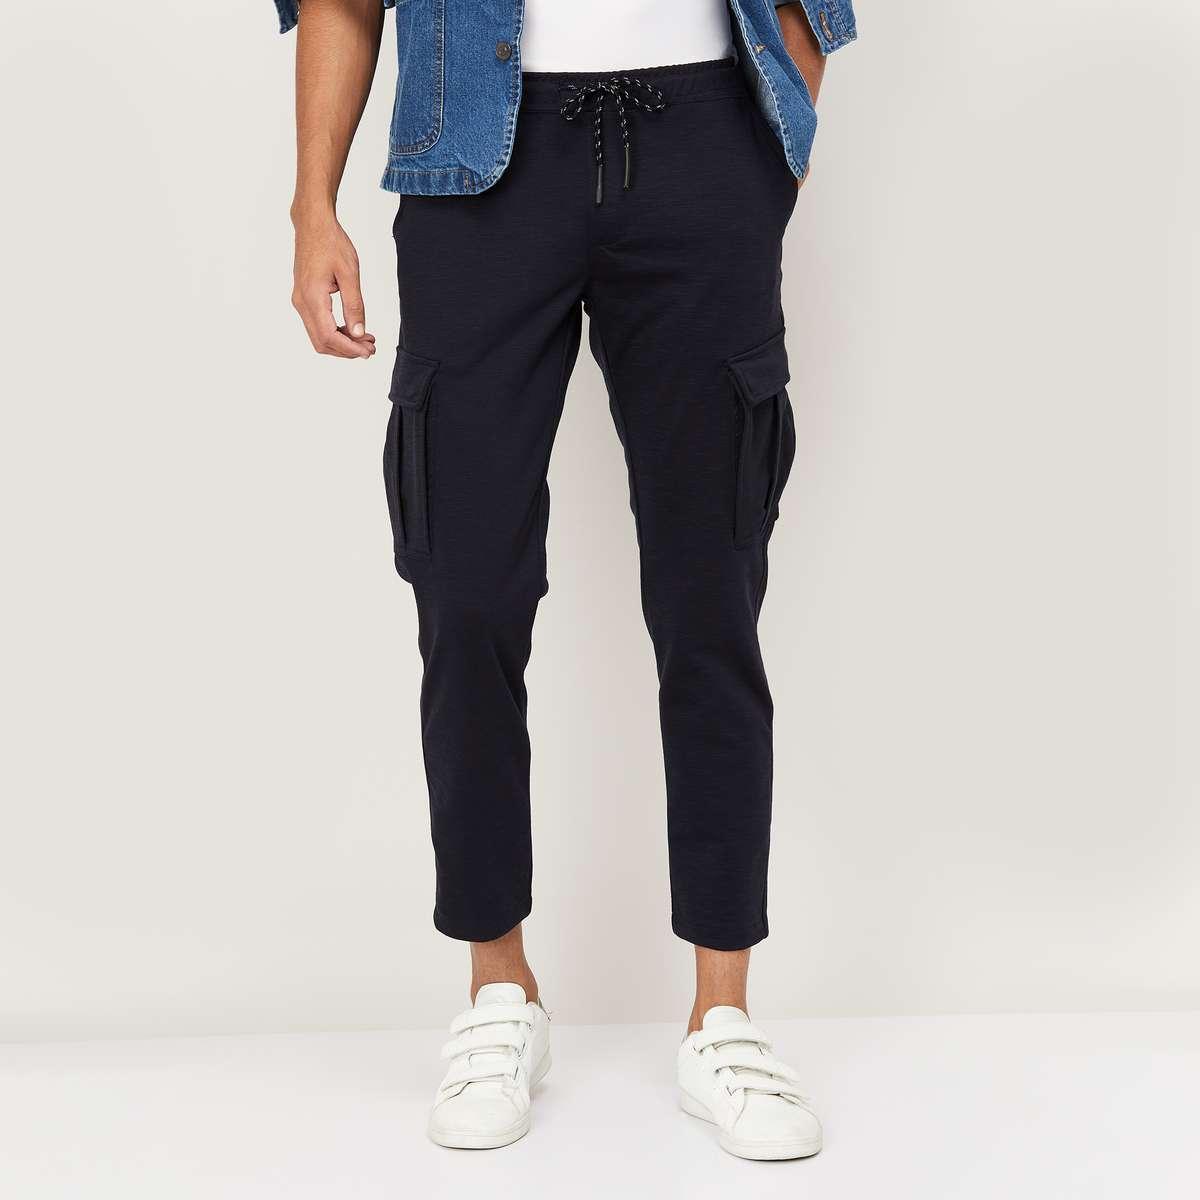 2.BOSSINI Men Solid Slim Tapered Elasticated Cargo Trousers